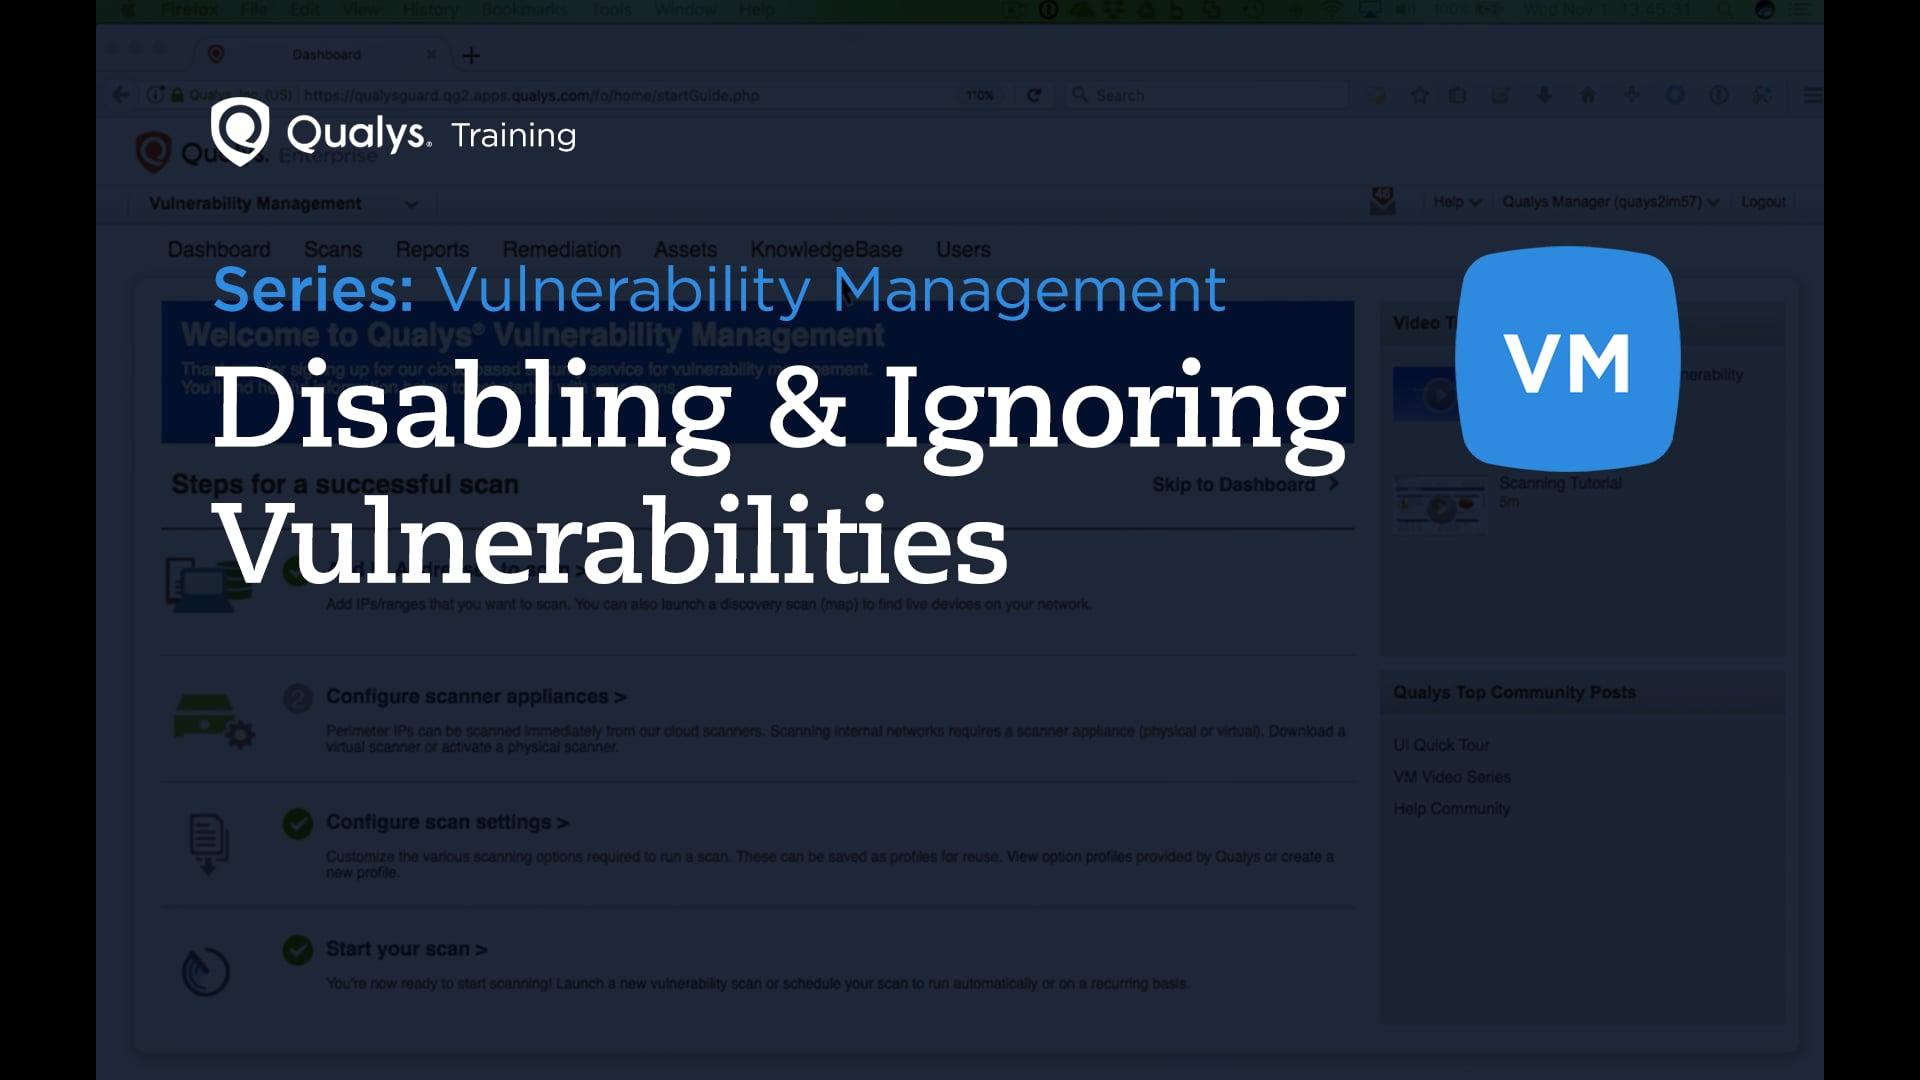 Disabling and Ignoring Vulnerabilities